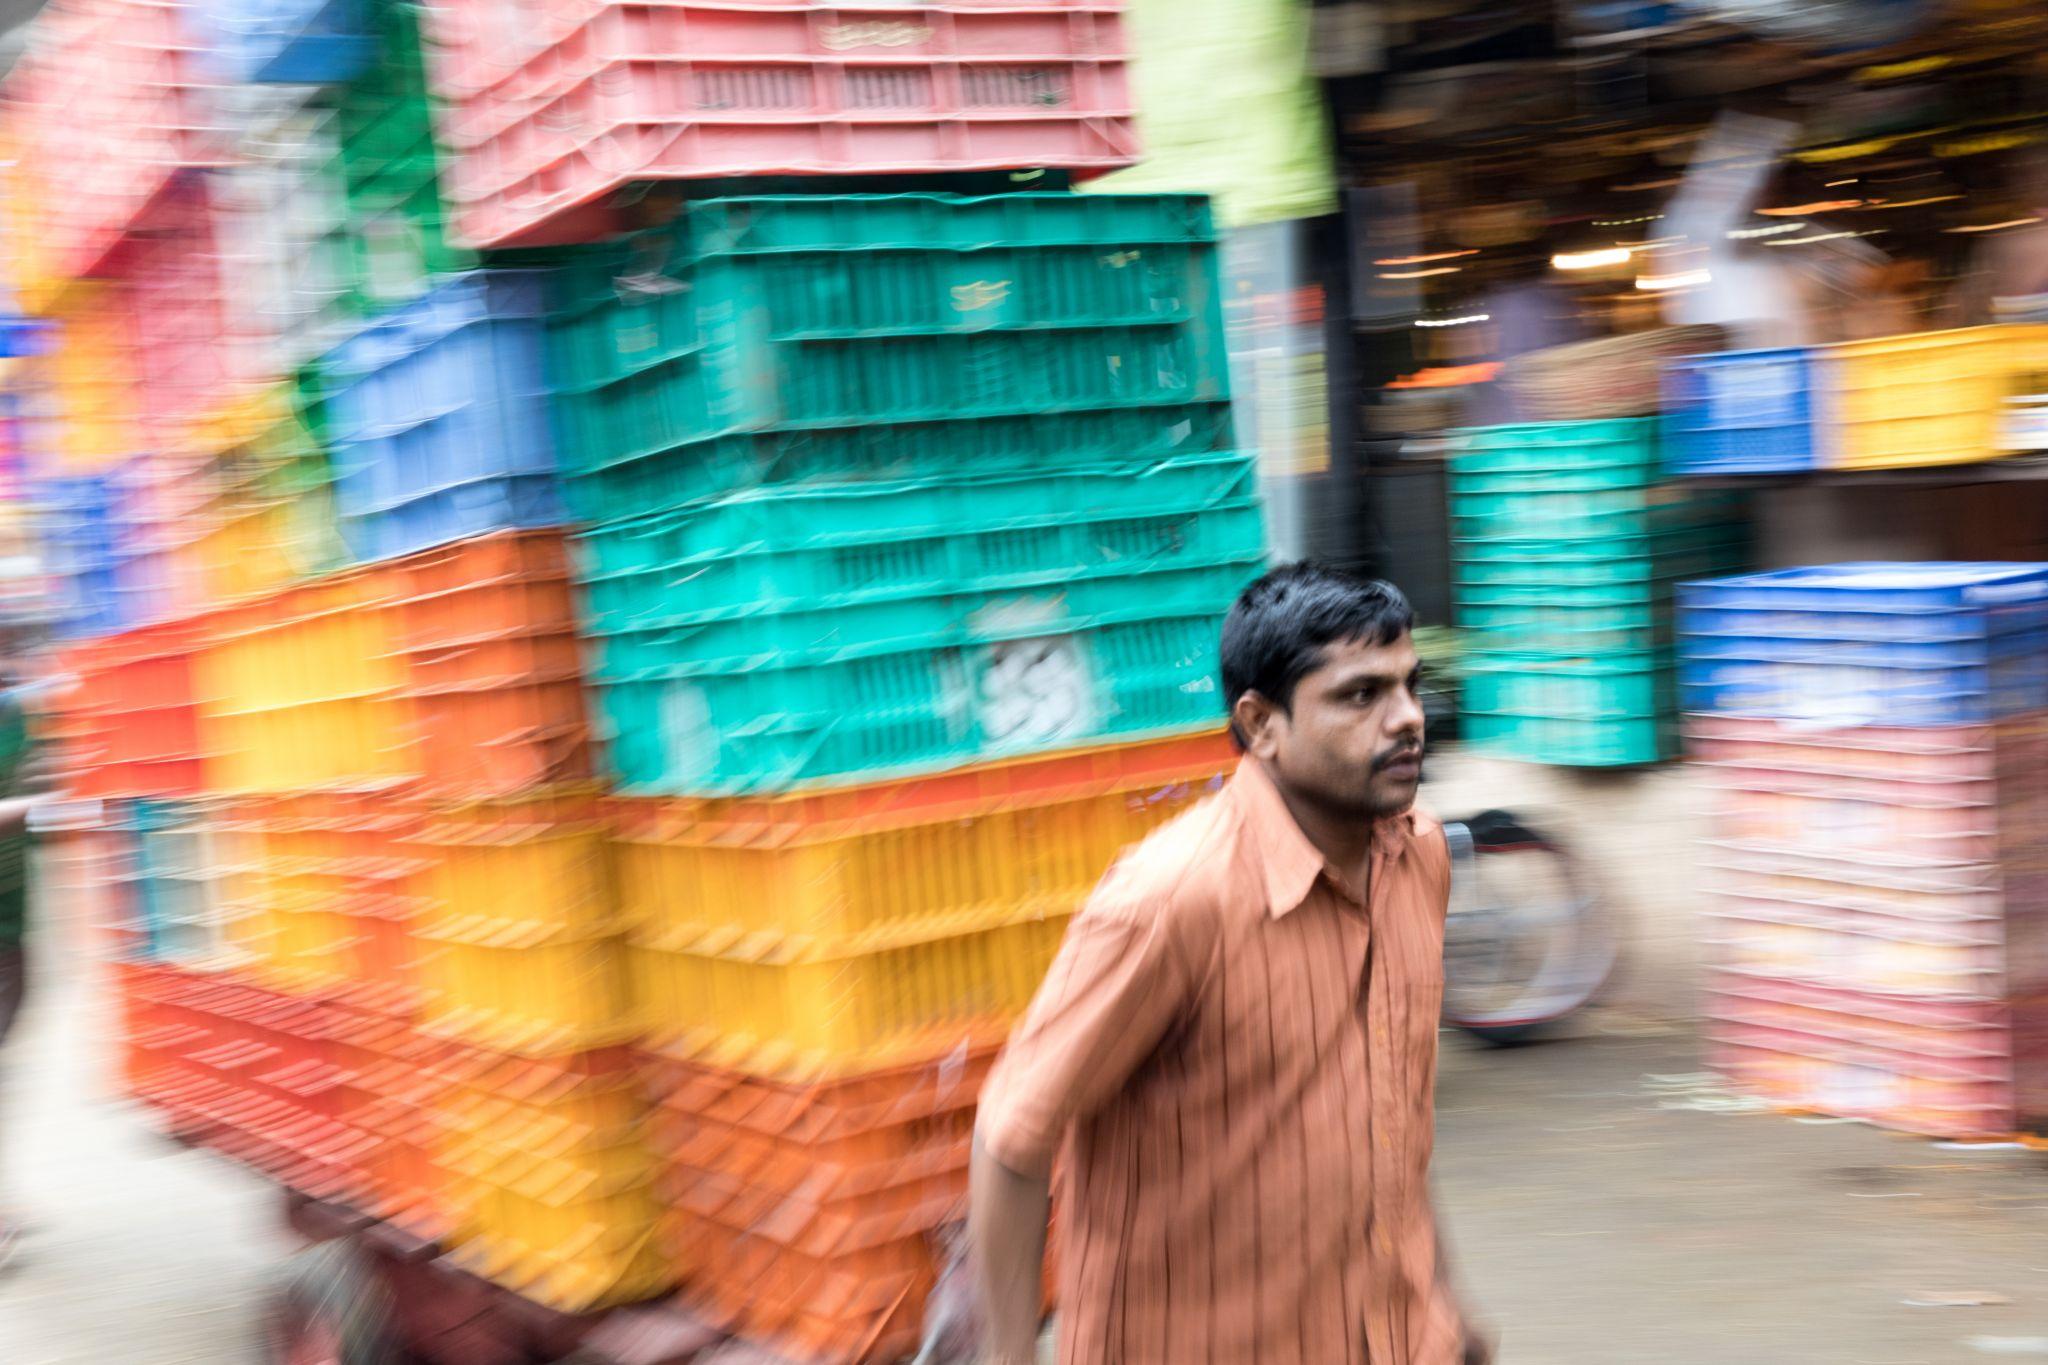 Flower Market, India